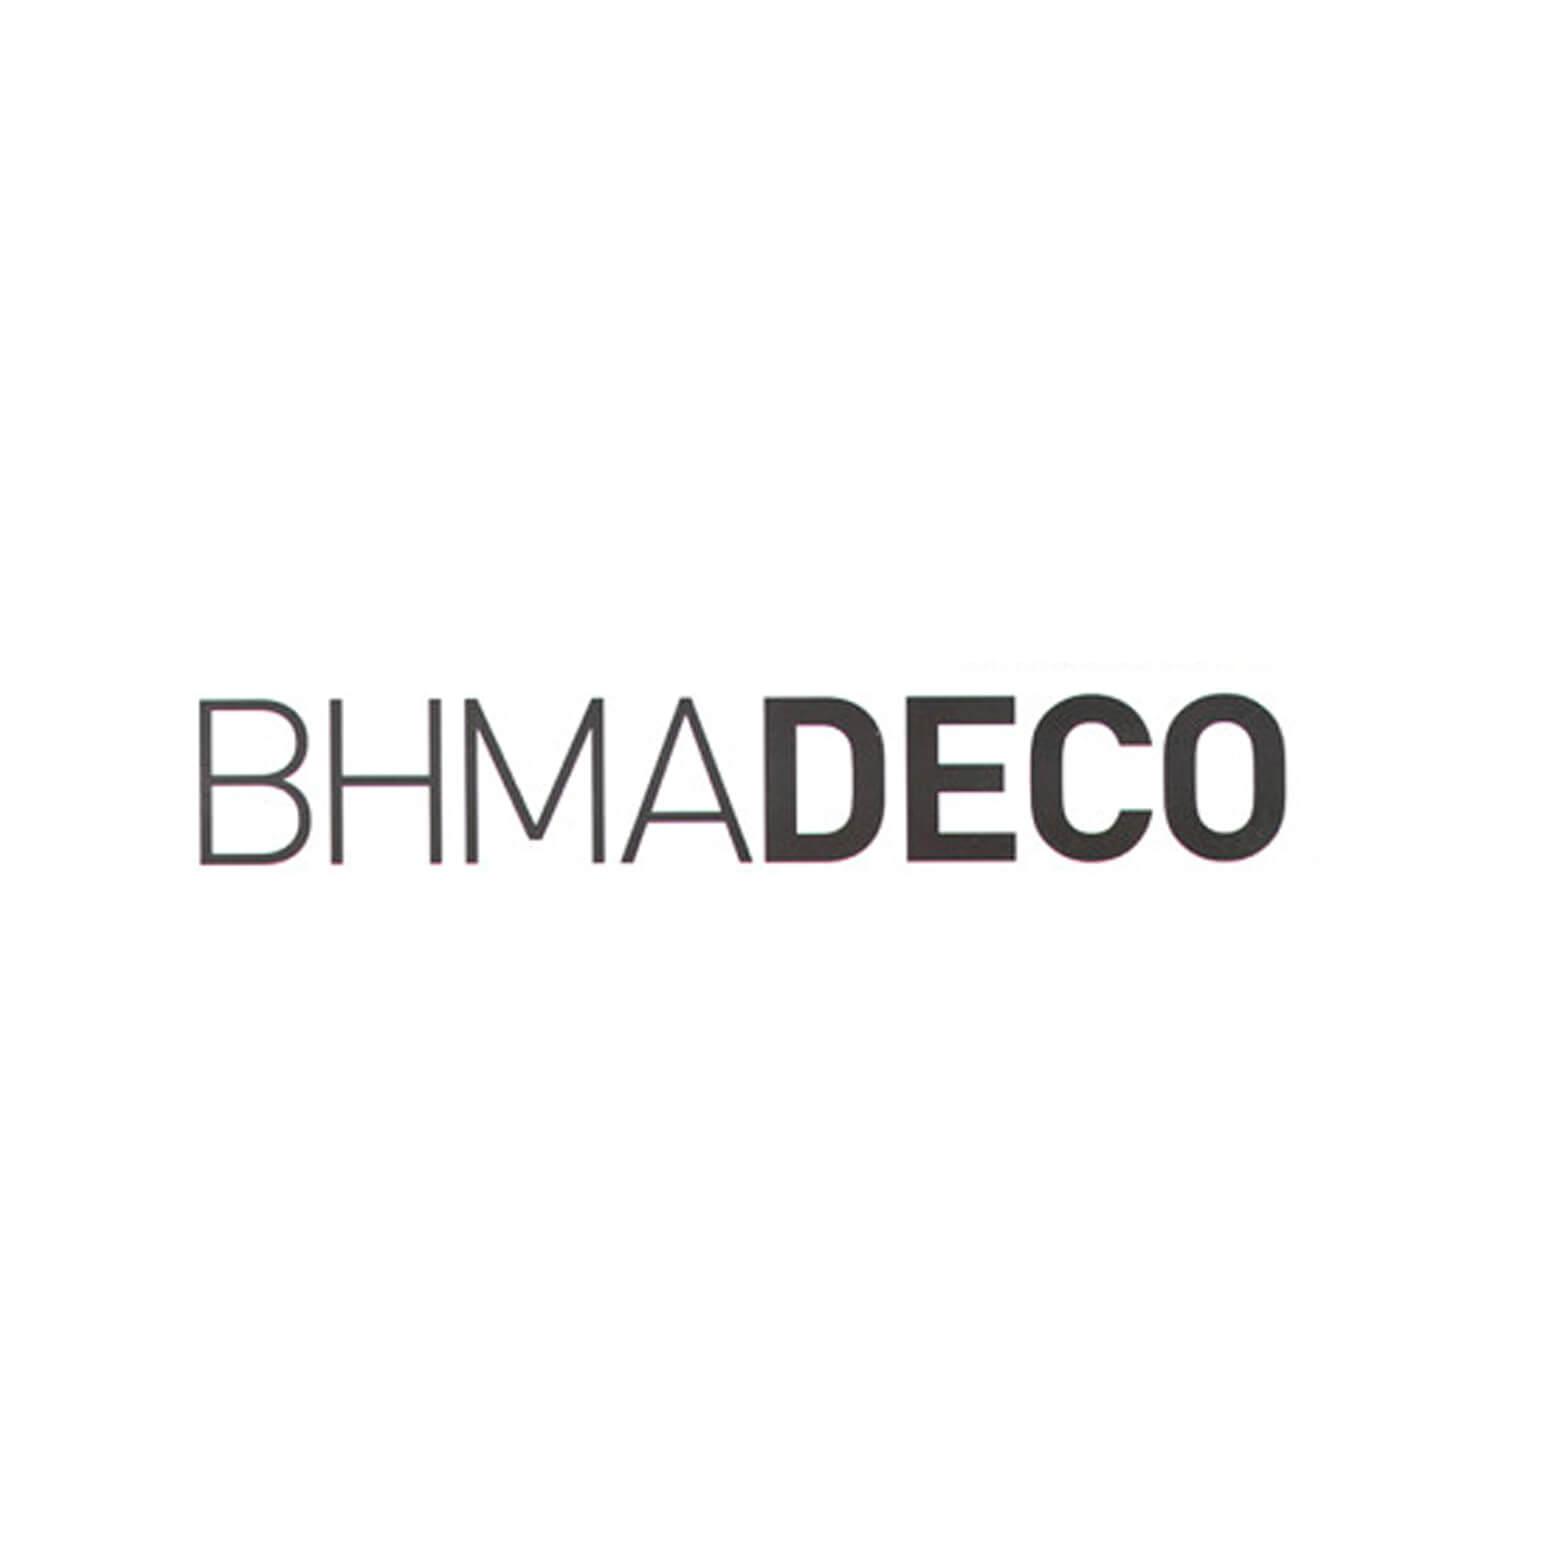 Greek Article In BHMADECO